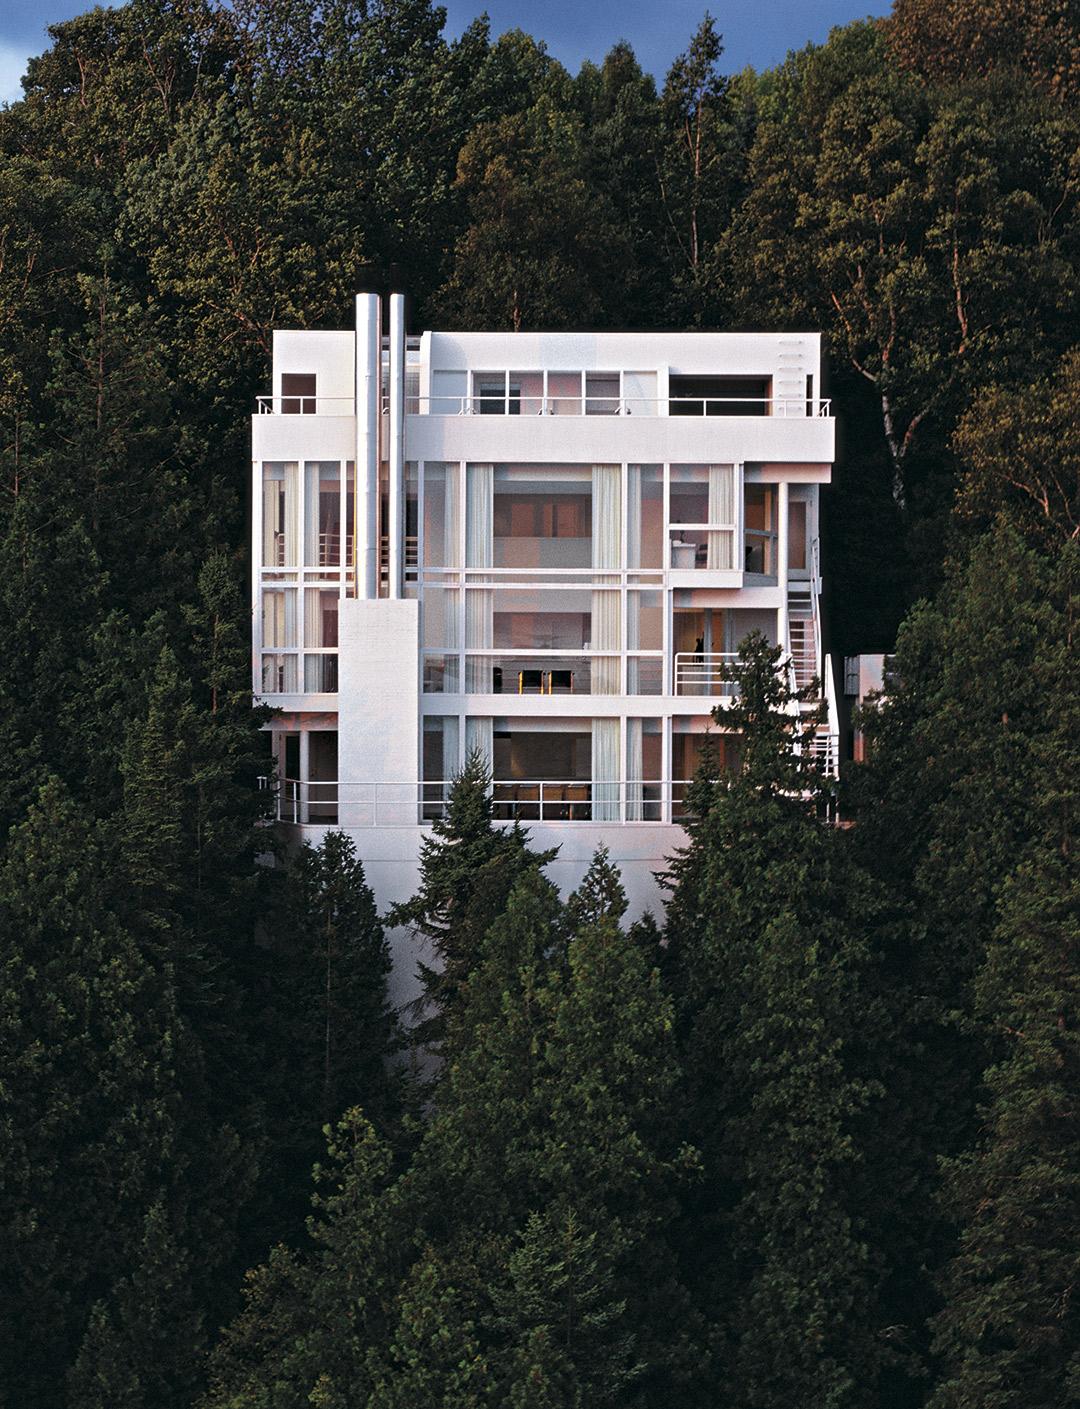 douglas house Original by me #acad #acad_whiz #douglas #house #meier #richard #whiz.